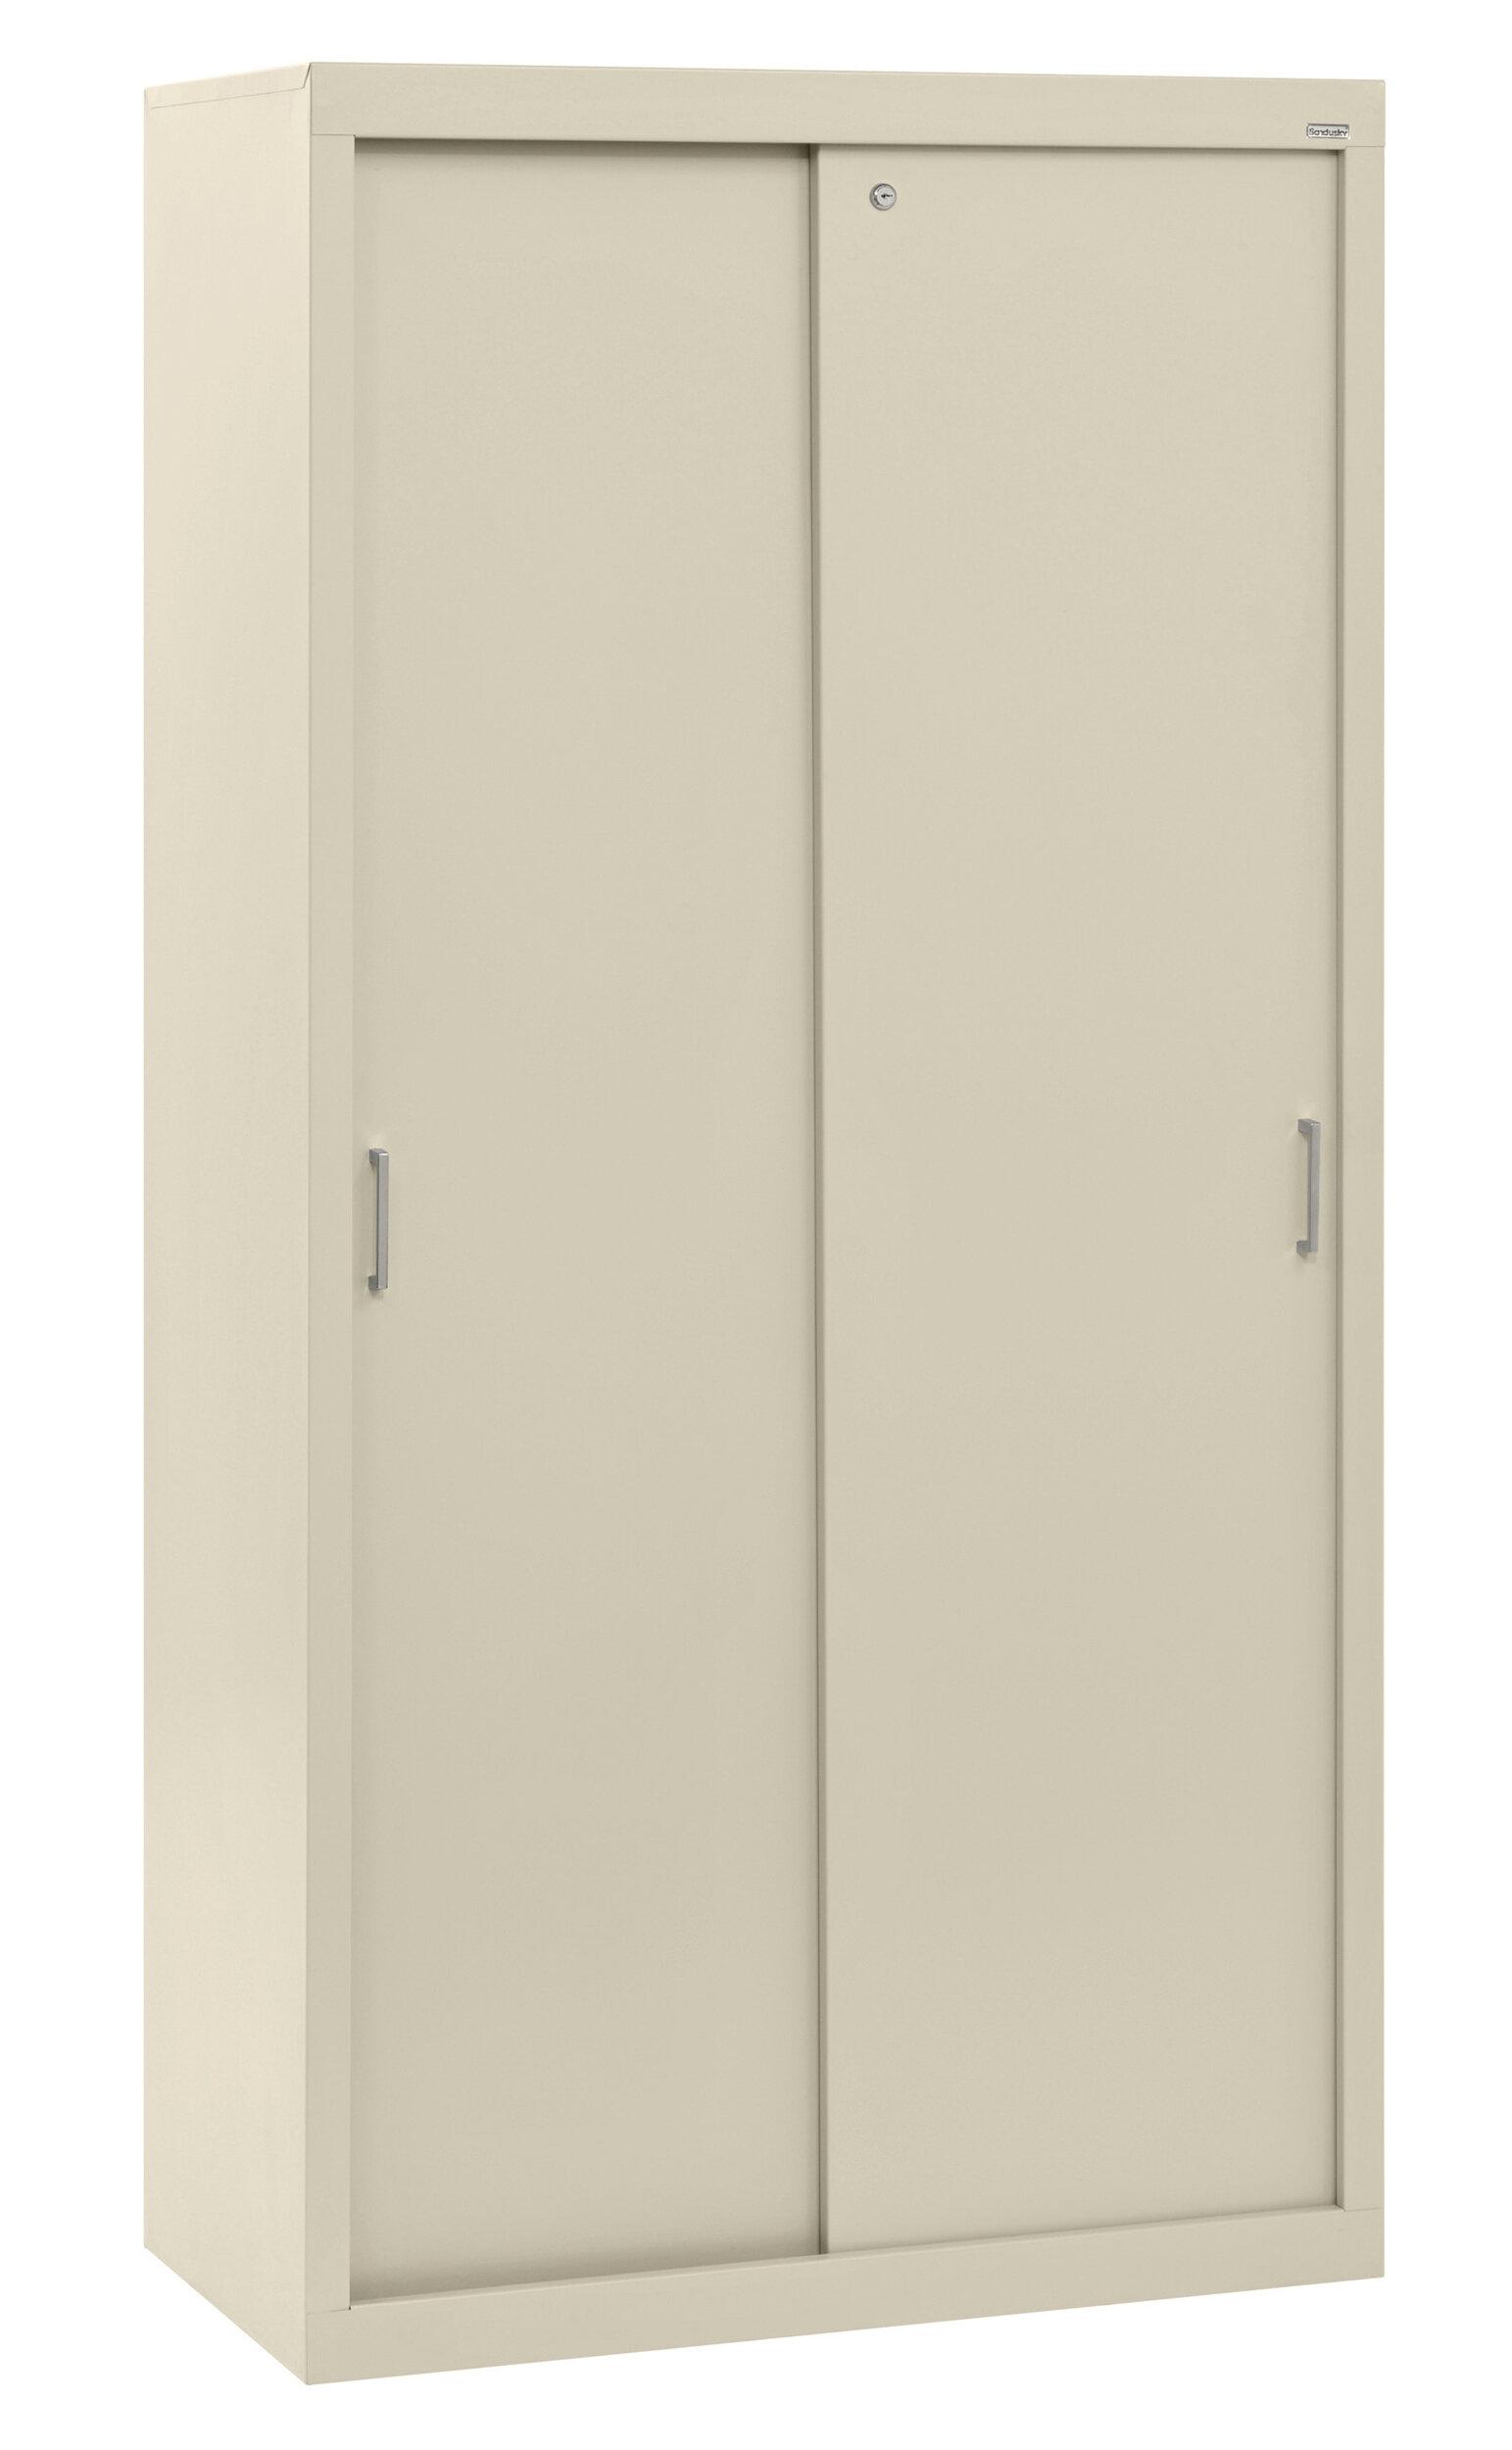 Sandusky Sliding Door Storage Cabinets 5 Shelf Storage Cabinet Reviews Wayfair